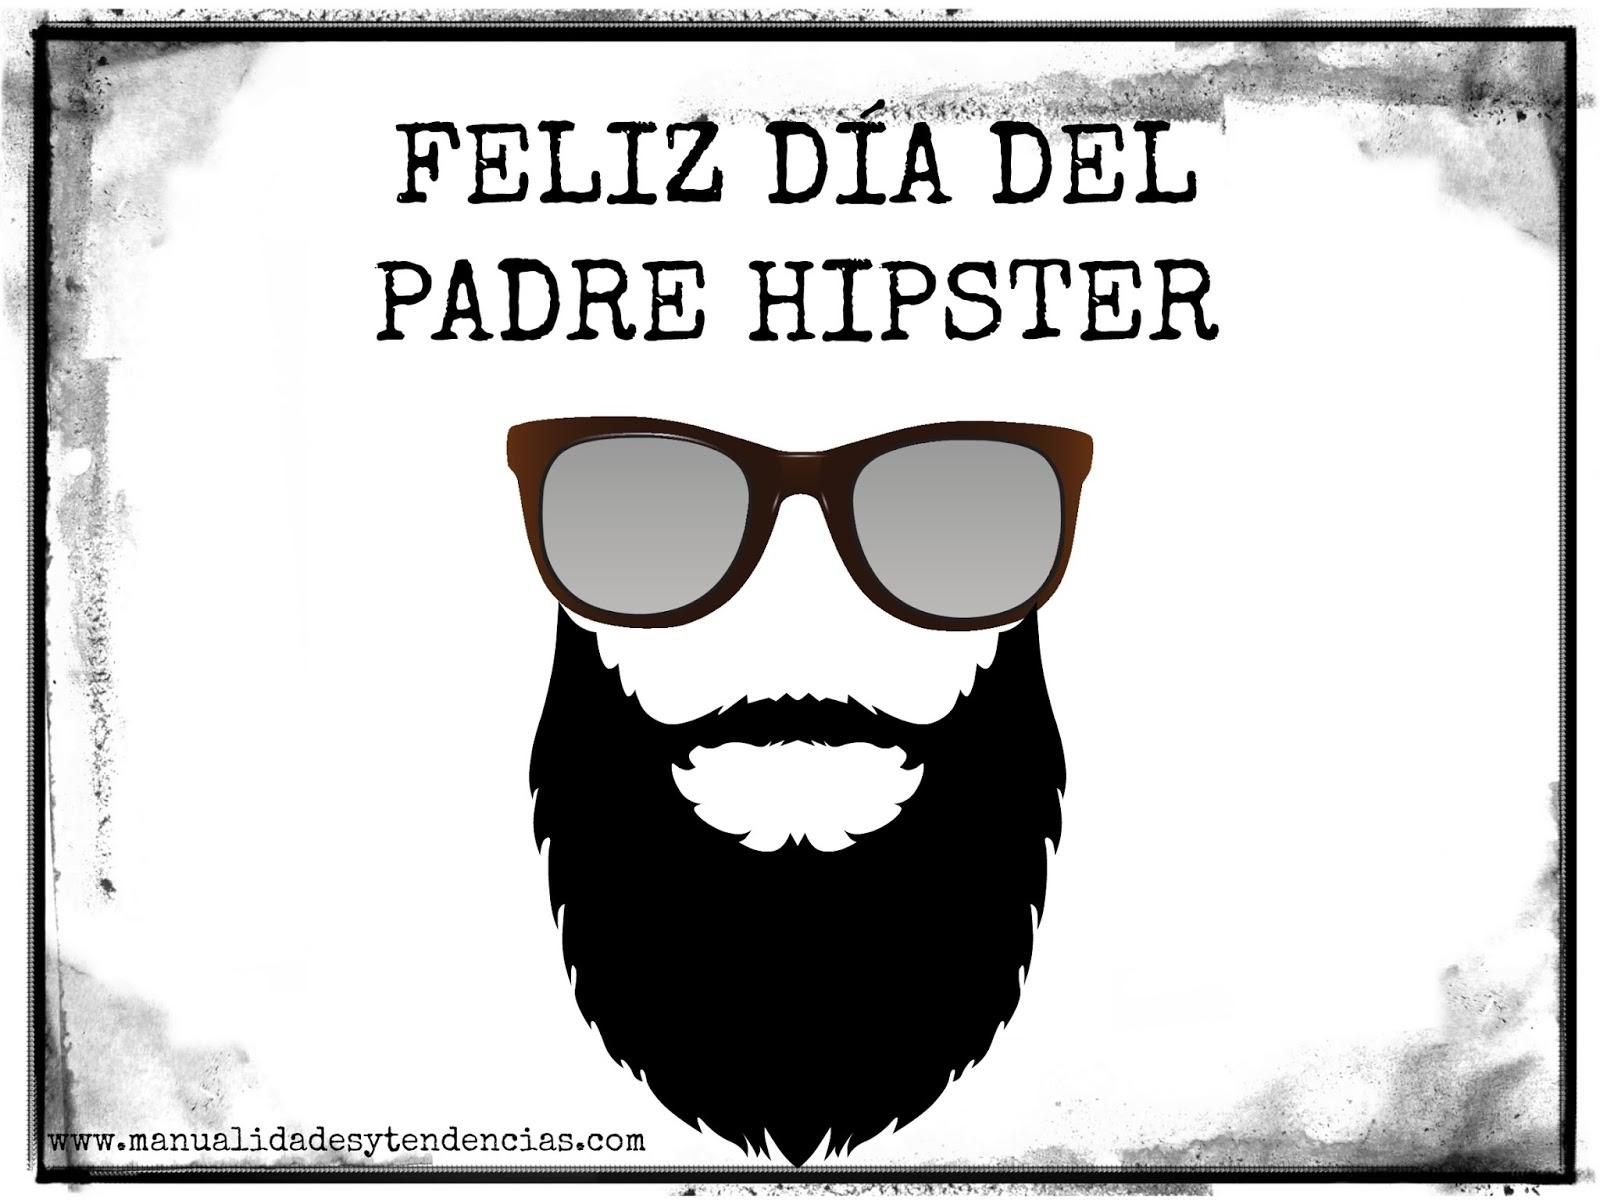 Manualidades Y Tendencias Tarjeta Para Padres Hipsters